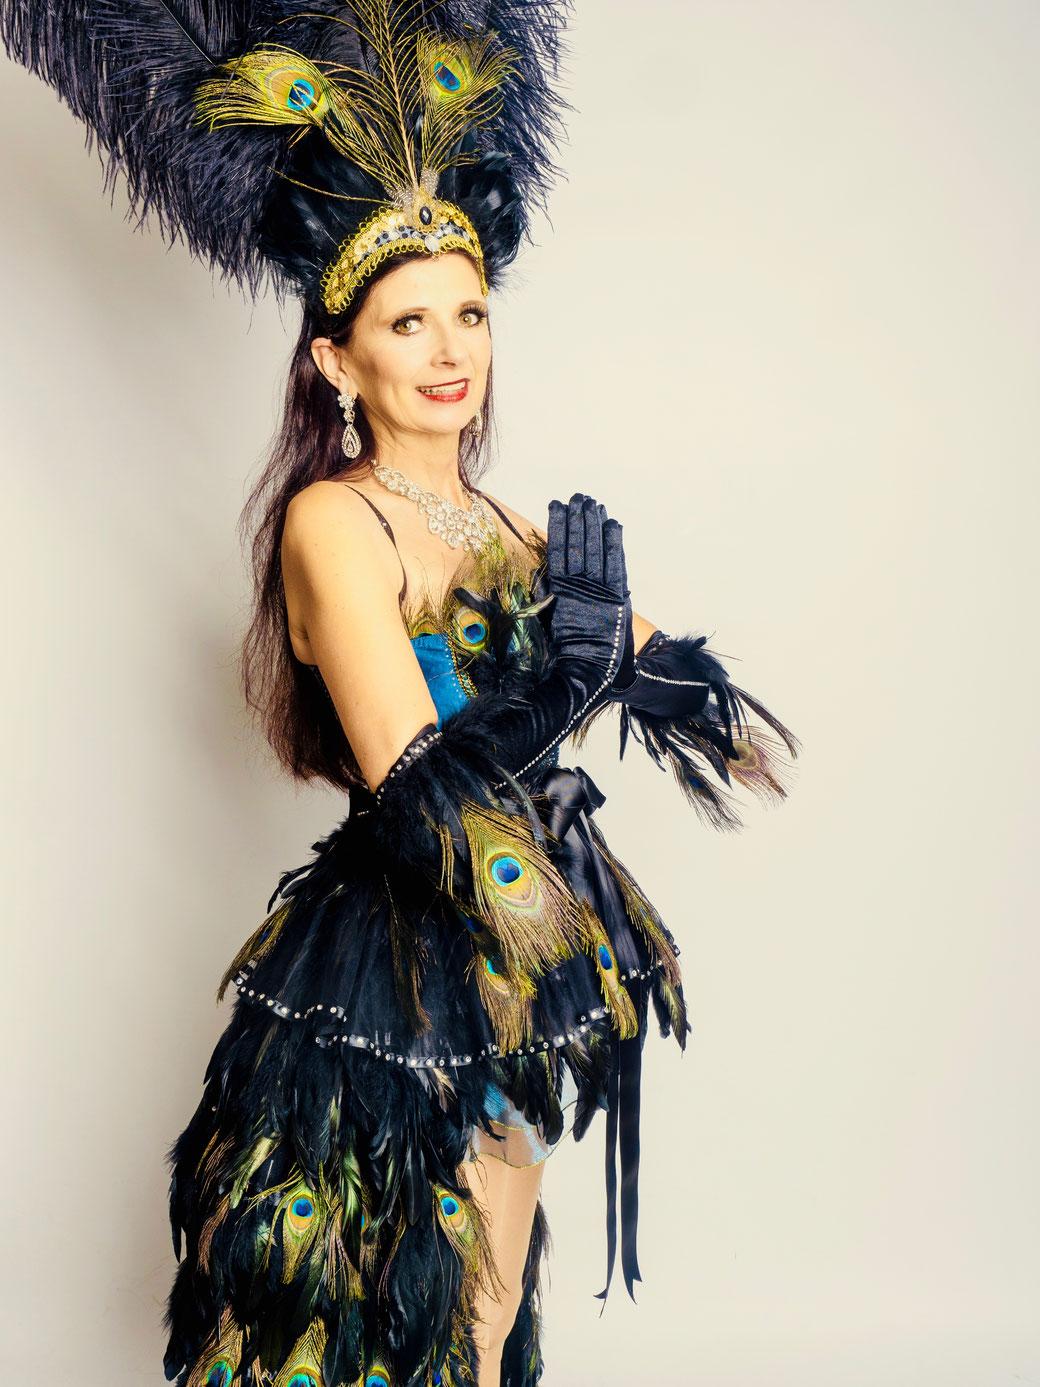 Burlesquelehrerin Vintage Dance Studio, Burlesque lernen, Striptease lernen München Bayern Deutschland, Burlesqueschule, Burlesquestudio, Burlesque Academy, Swingtanzschule